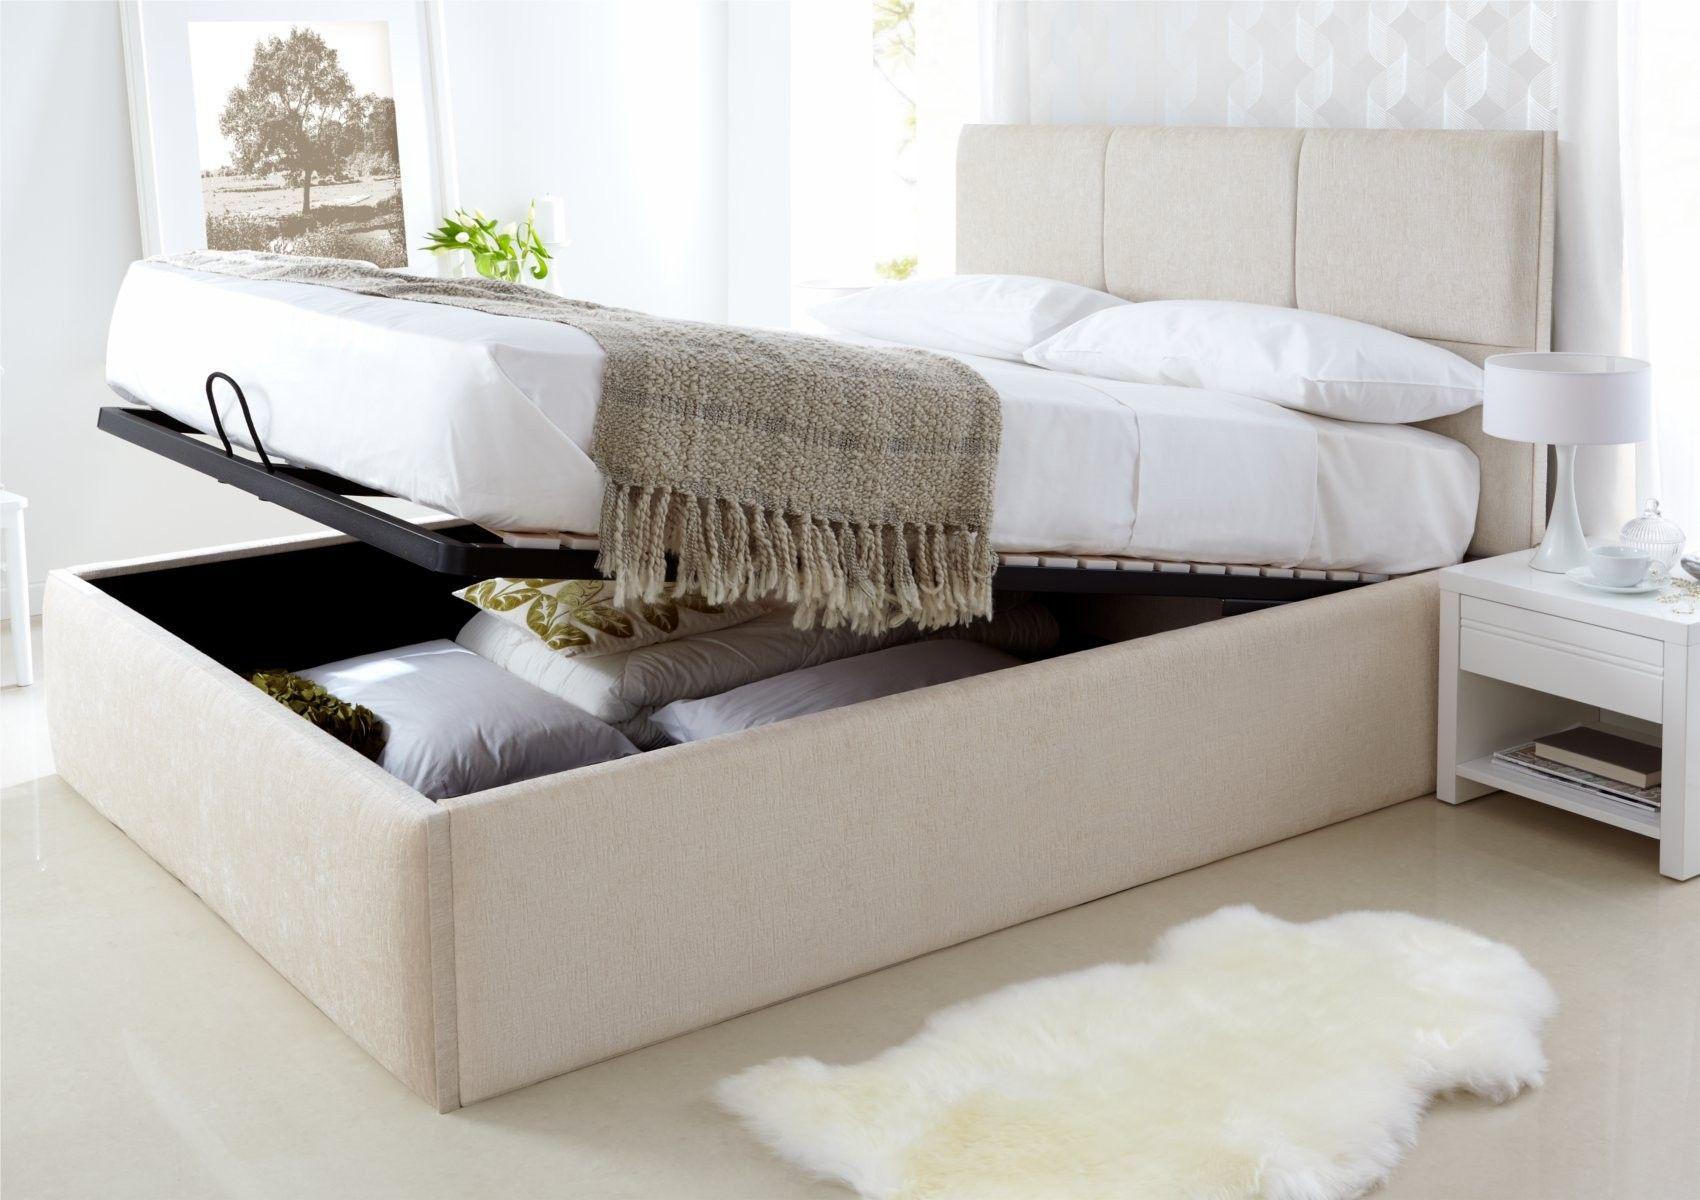 Retreat Ottoman Storage Bed Ottoman Beds Storage Beds Beds Ottoman Storage Bed Ottoman Bed Bed Storage